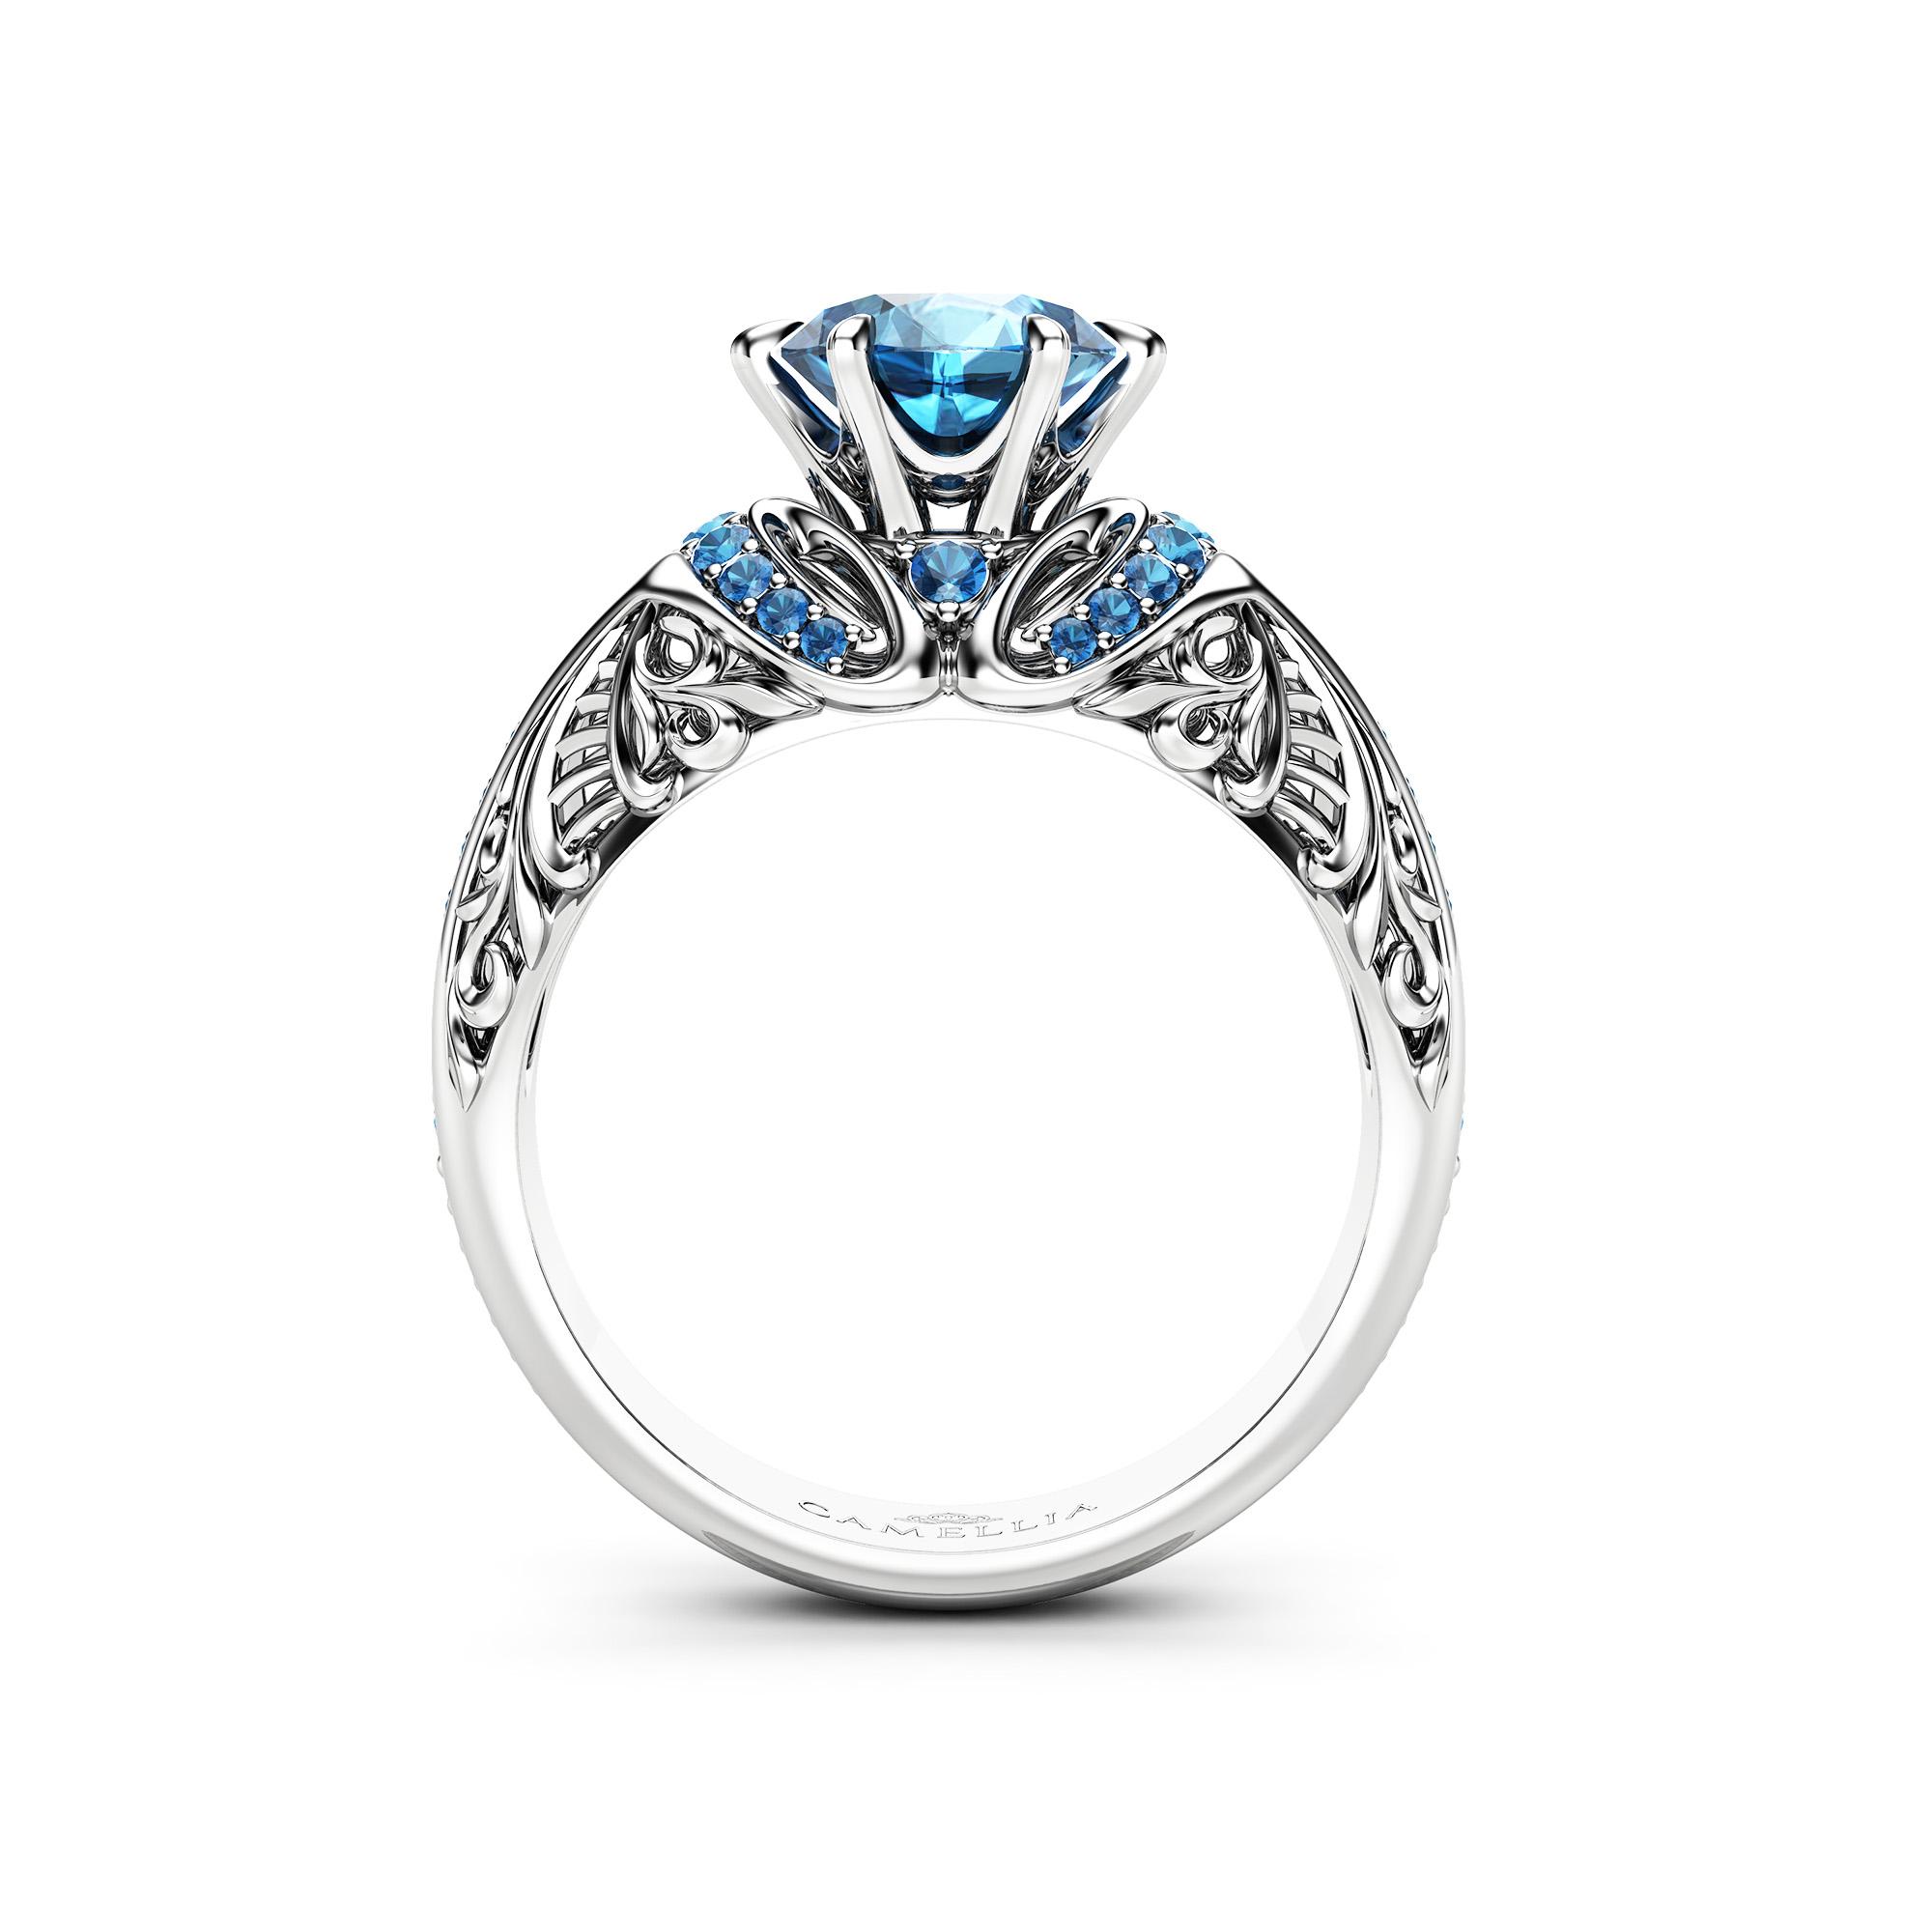 1.2 Carat Blue Diamond Ring White Gold Engagement Ring 14K Solid Gold Statement Ring